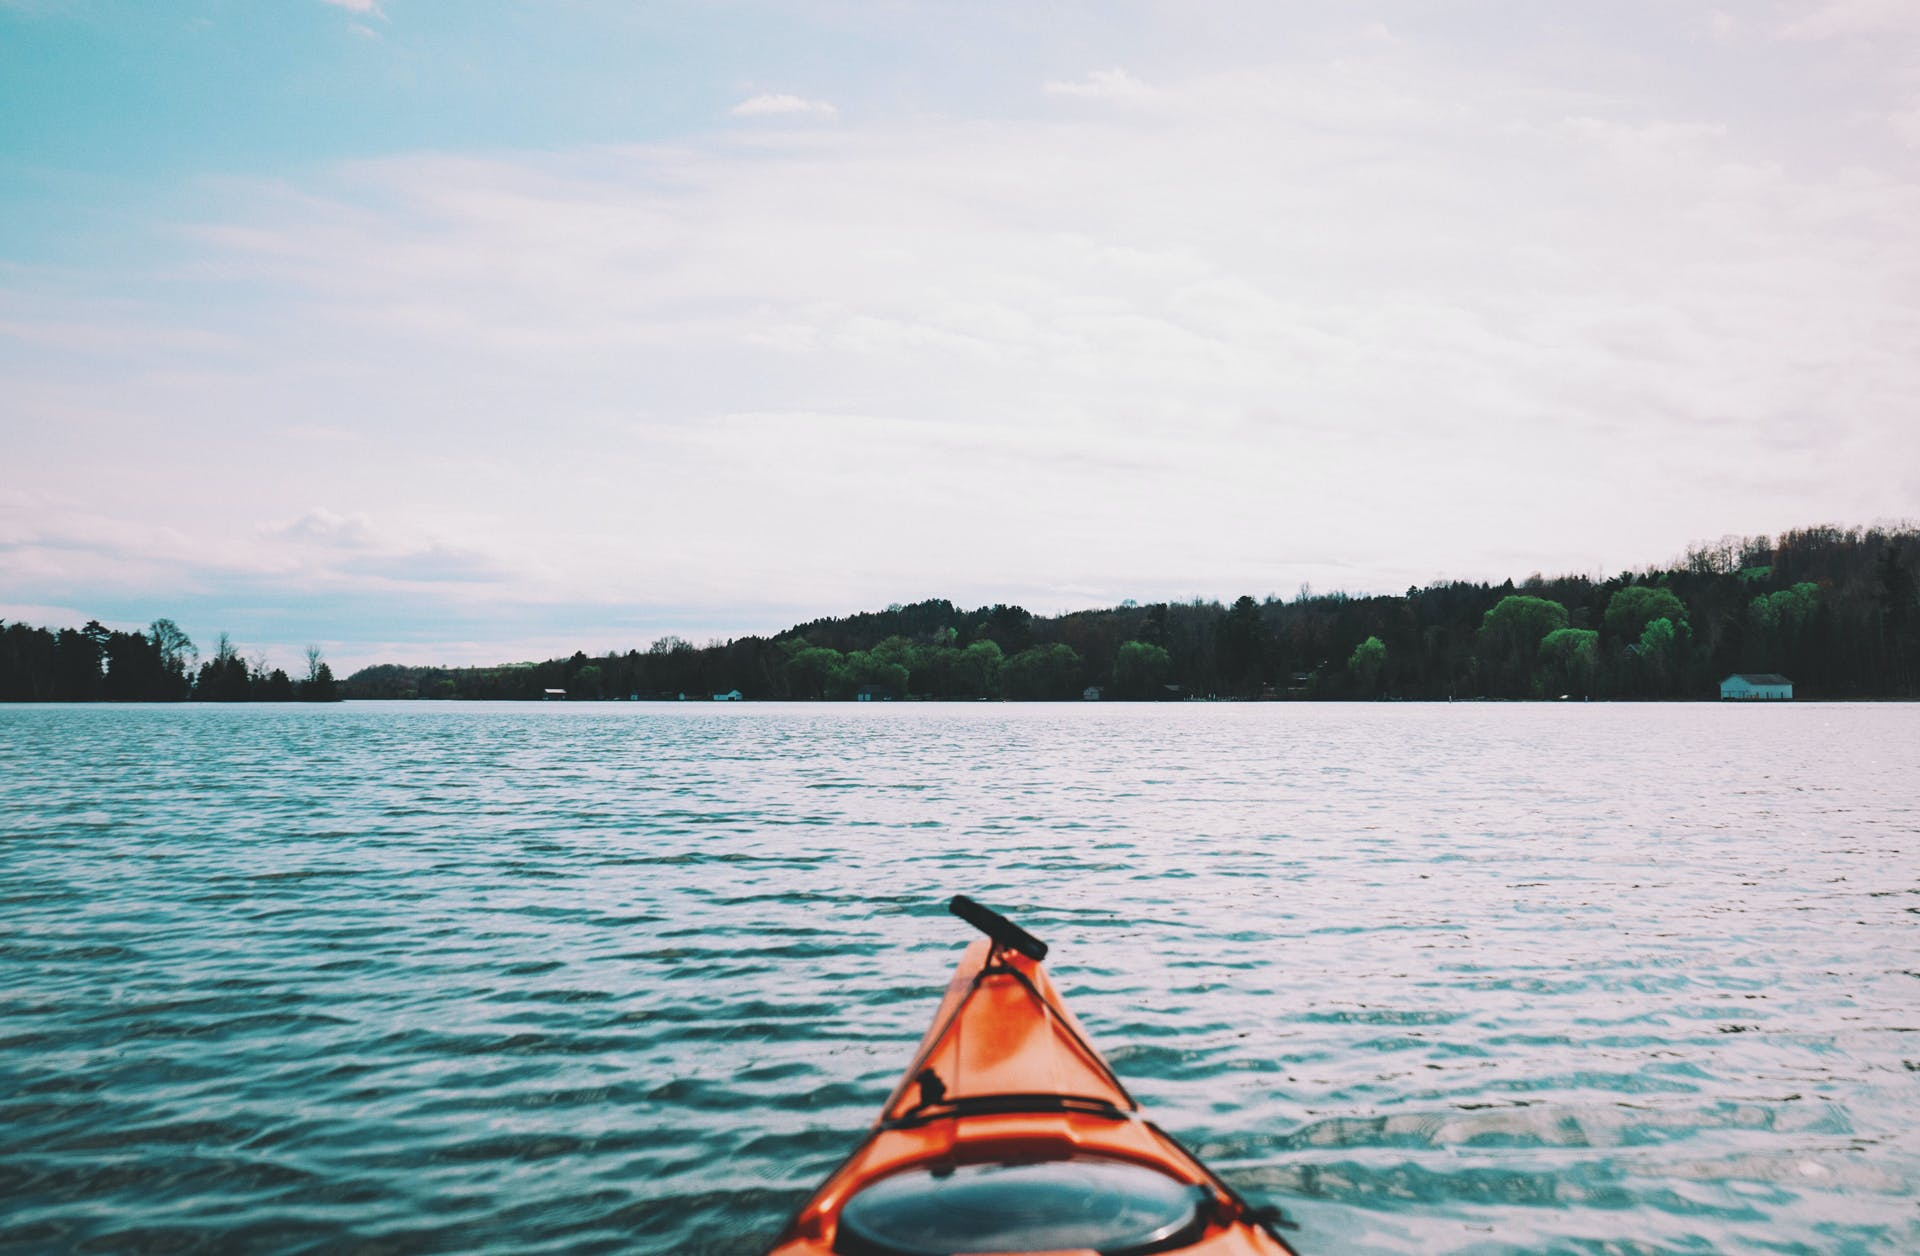 Person Riding Orange Kayak in Middle of Ocean